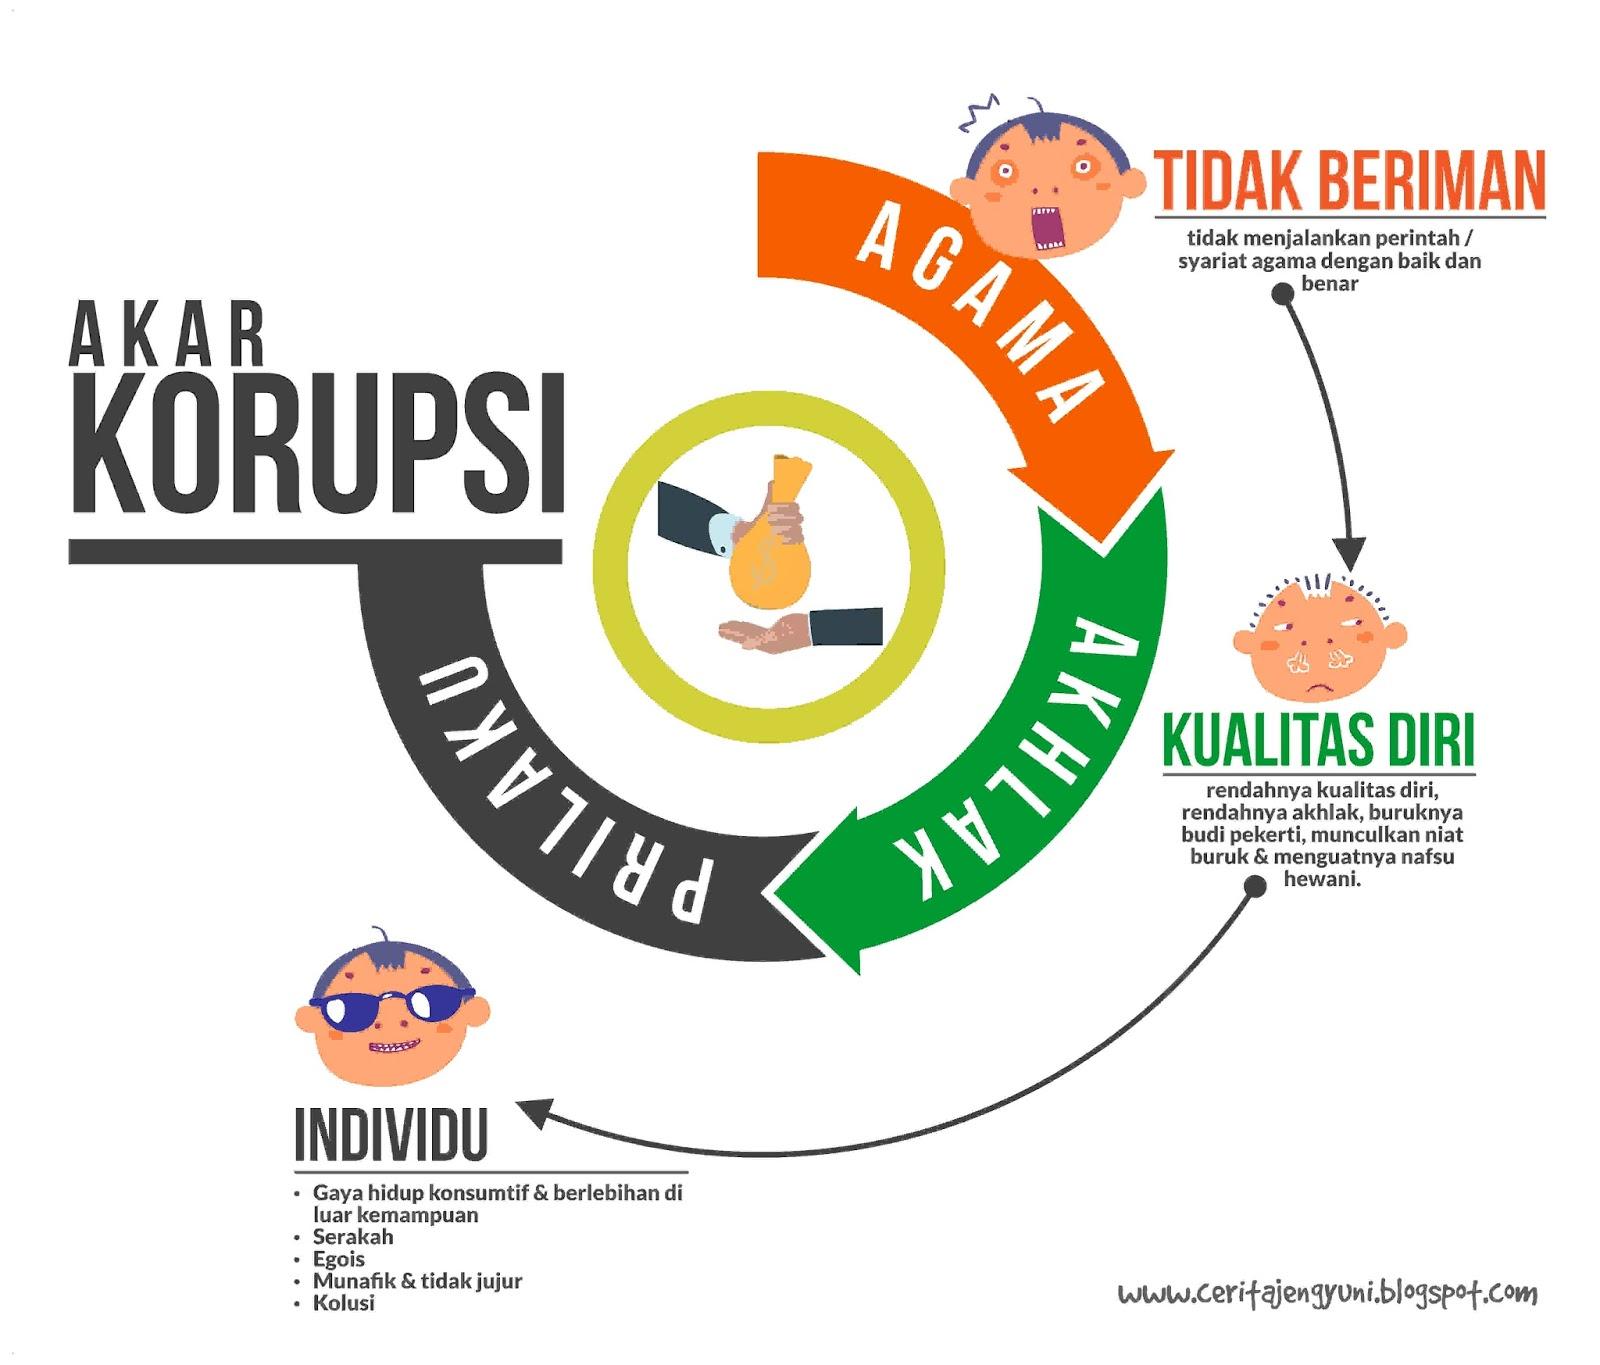 Akar Korupsi